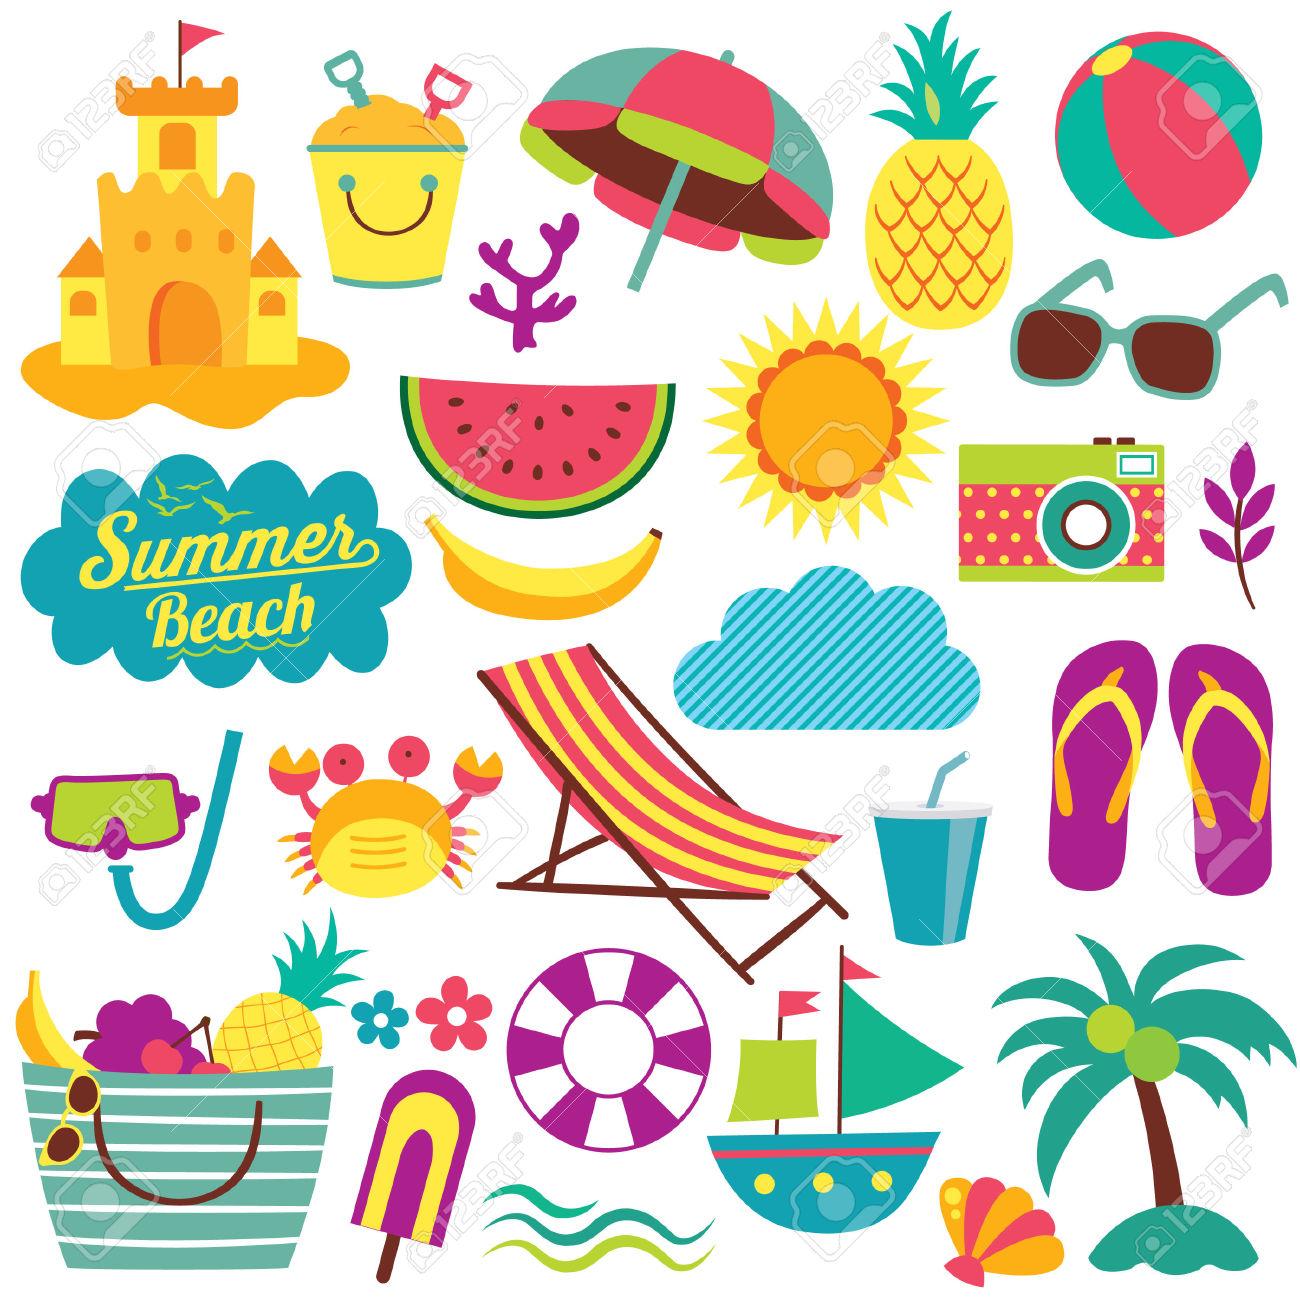 Summer Day Elements Clip Art Set Royalty Free Cliparts, Vectors.